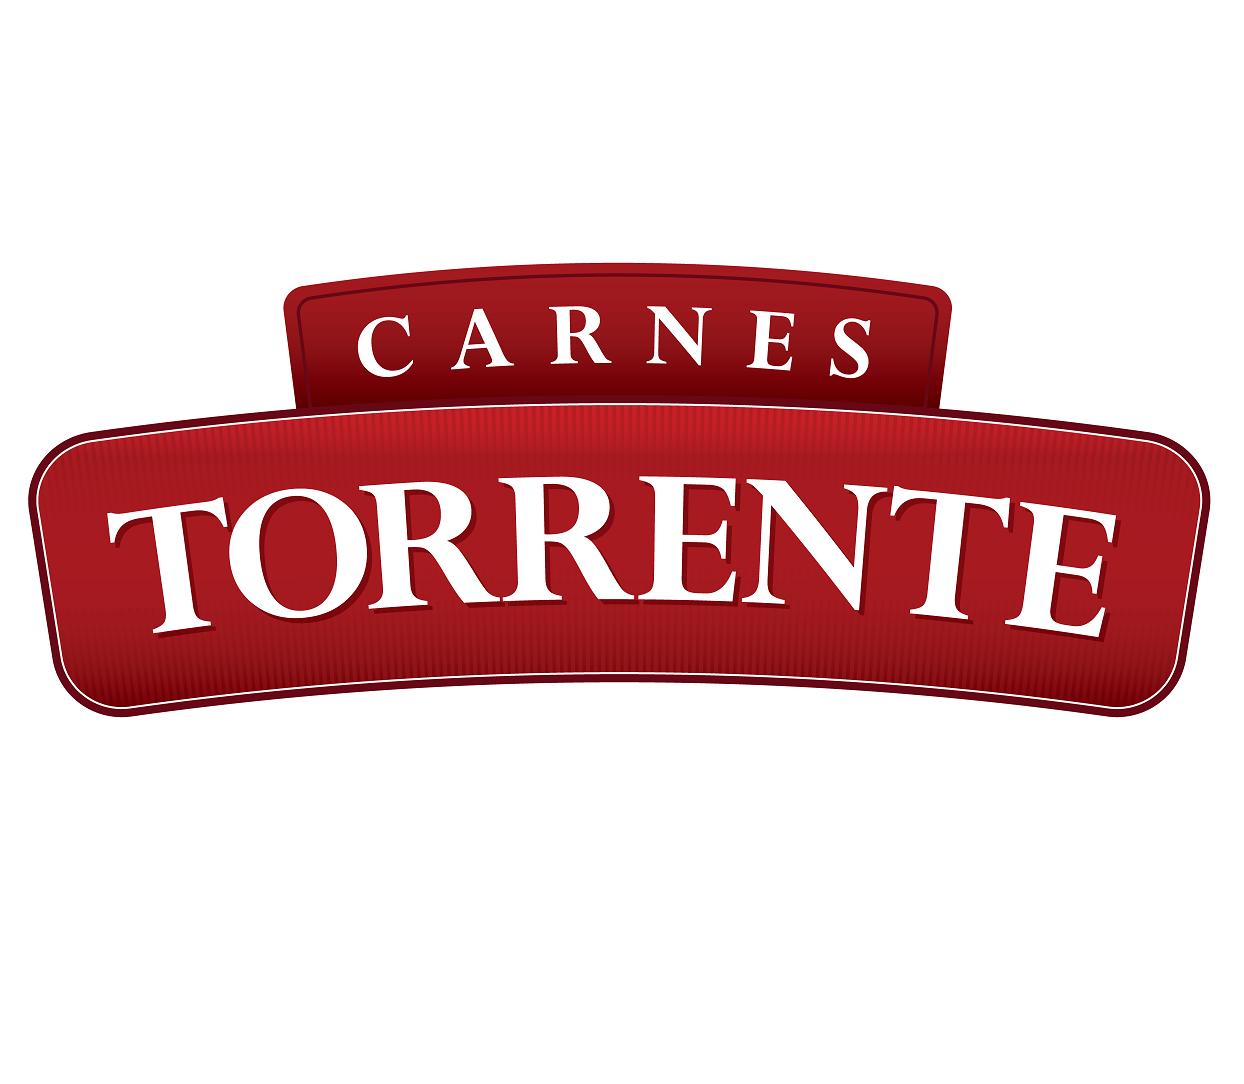 Carnes Torrente